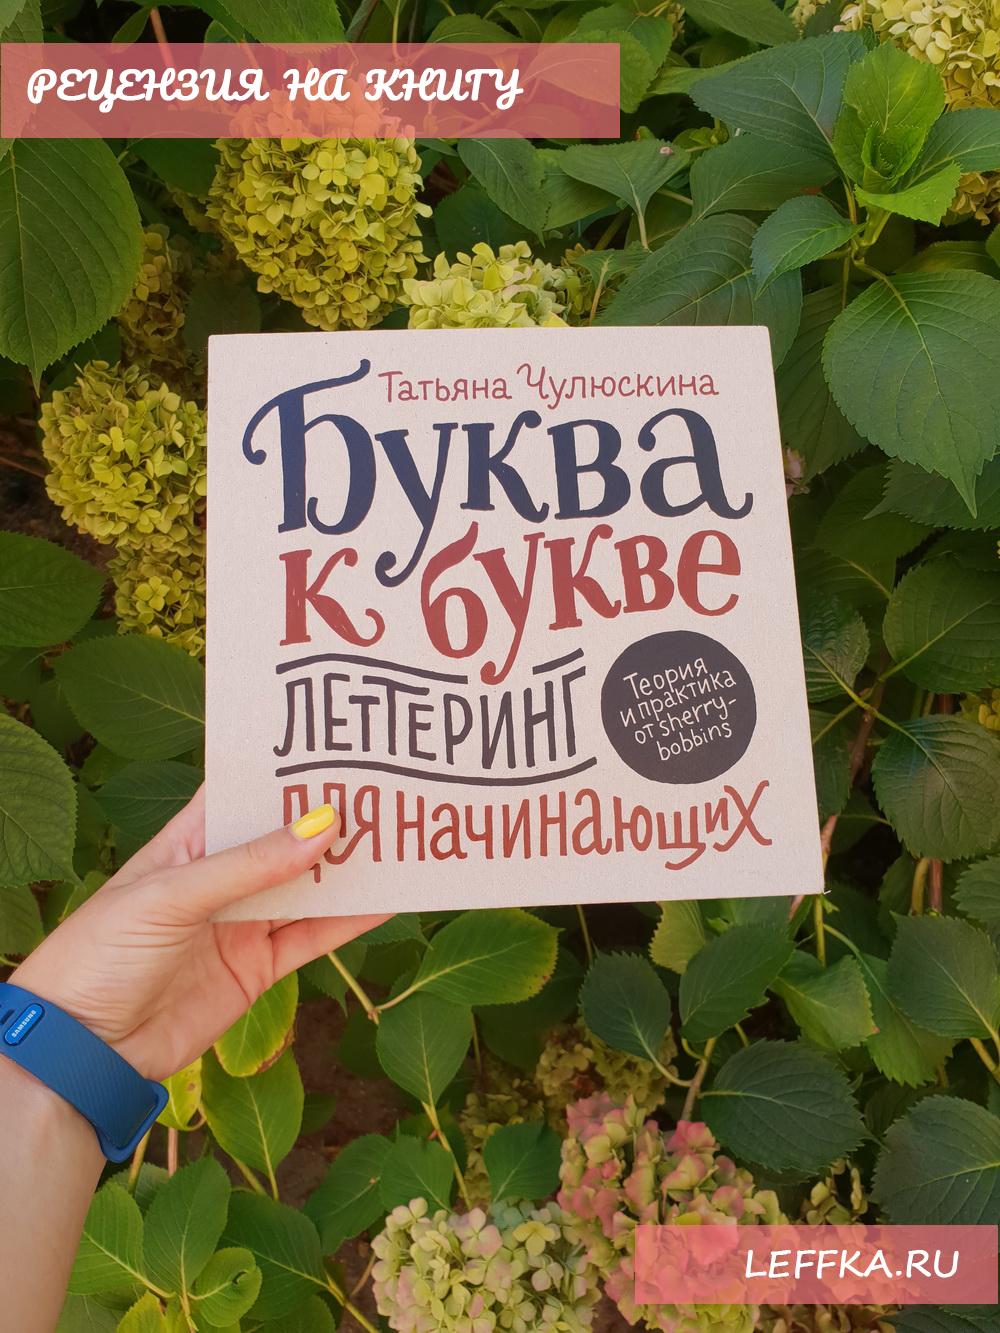 Рецензия на книгу Буква к букве - leffka.ru